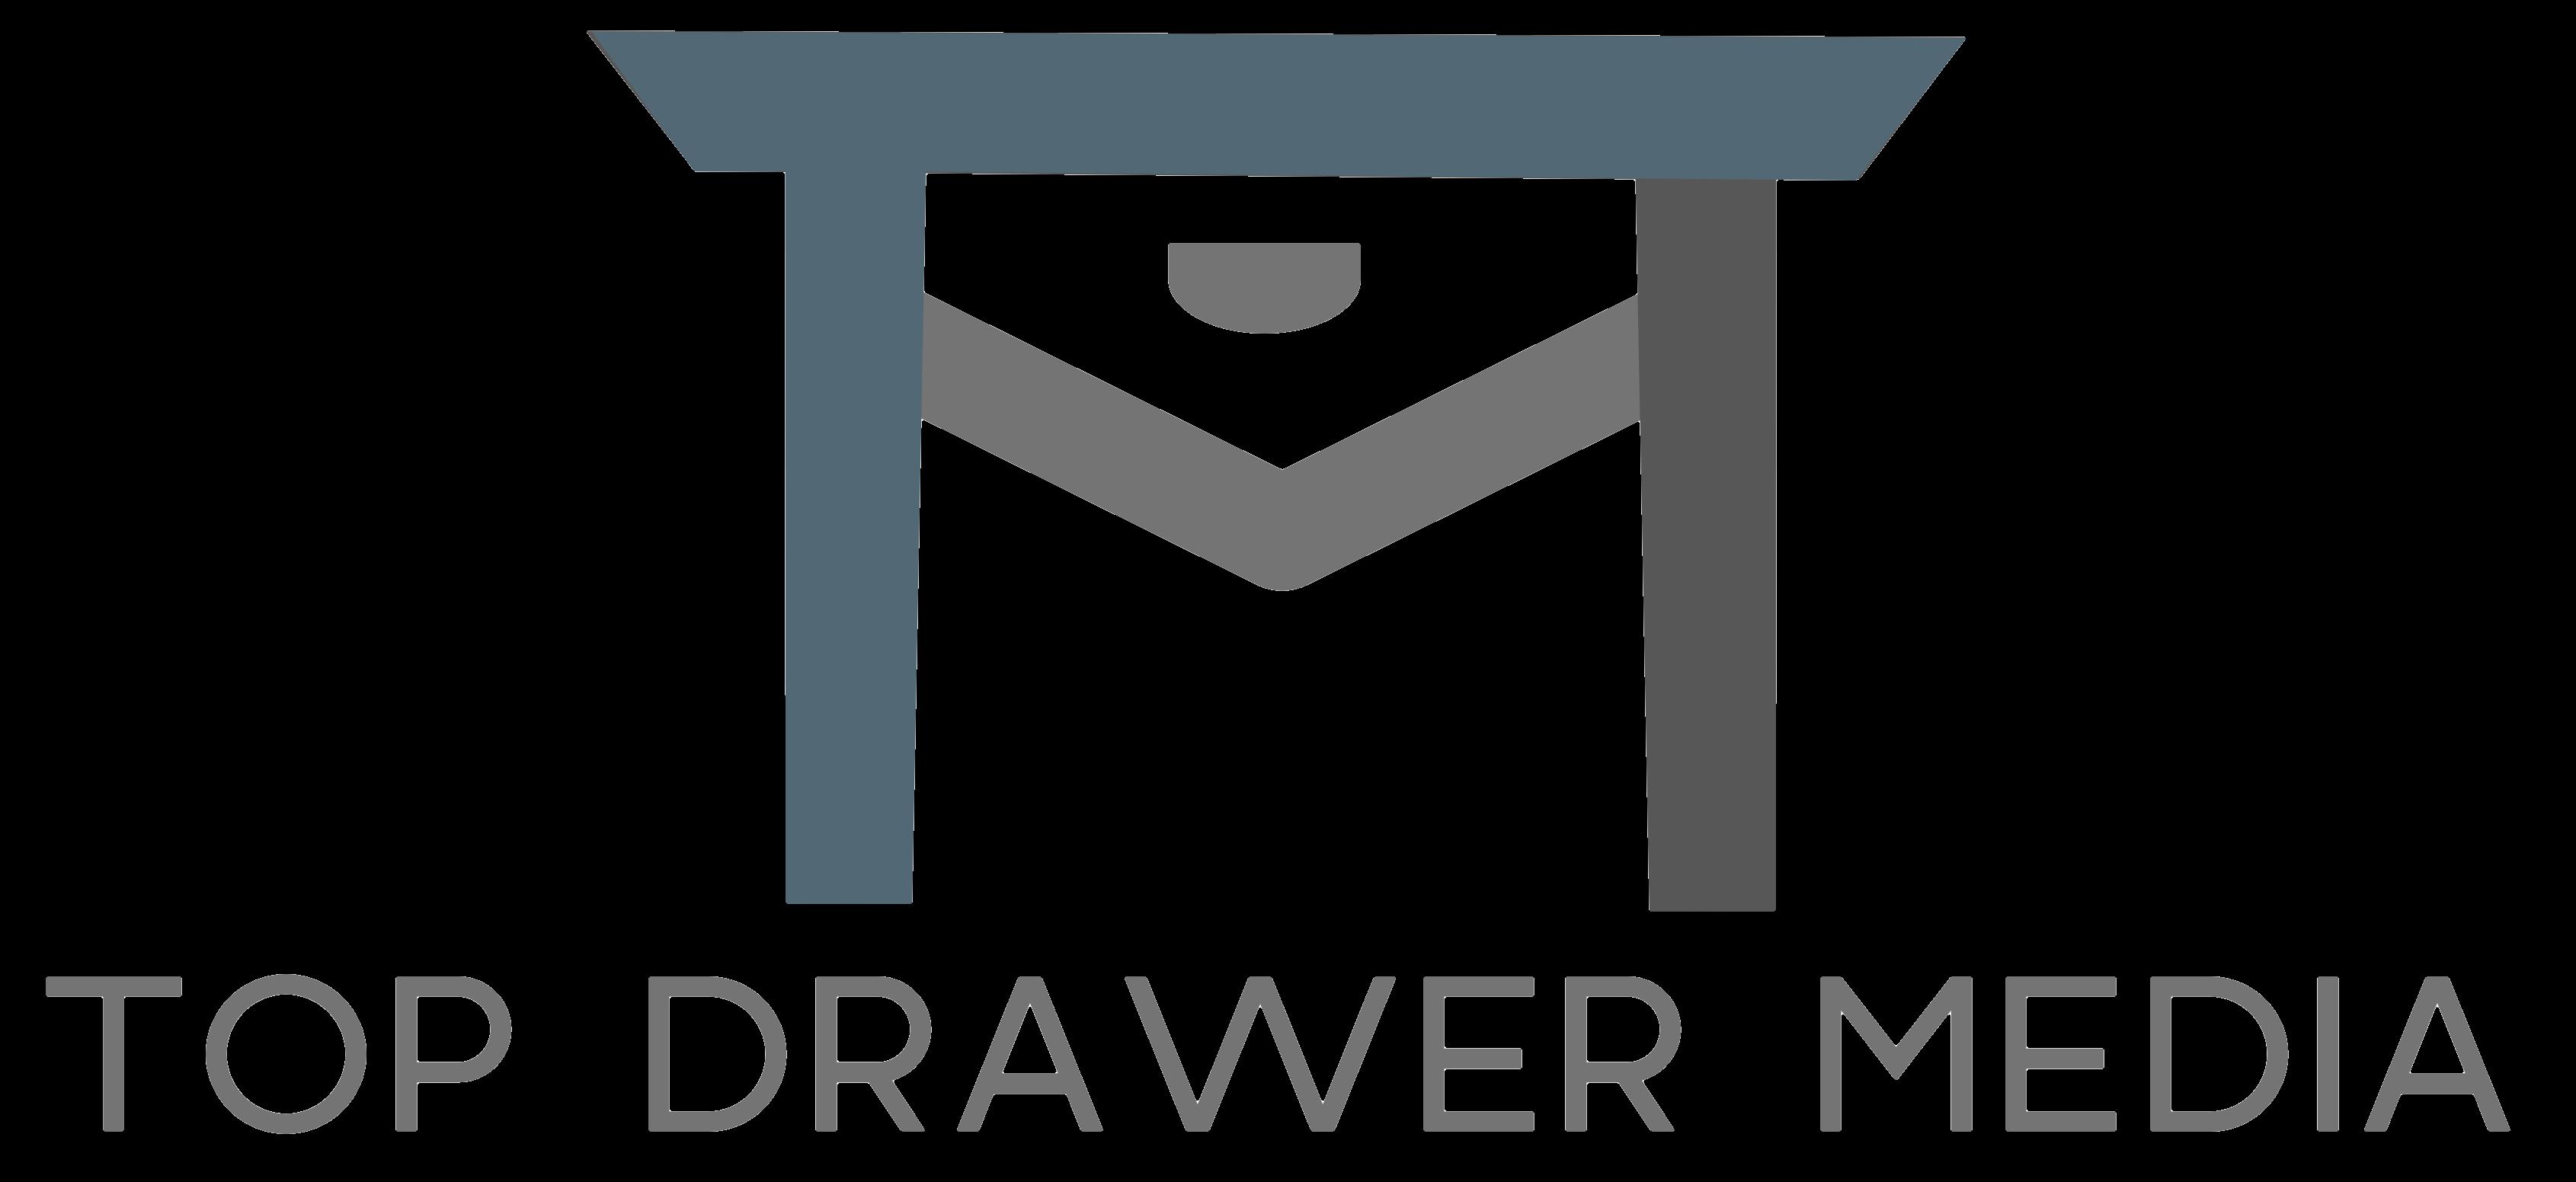 Top Drawer Media